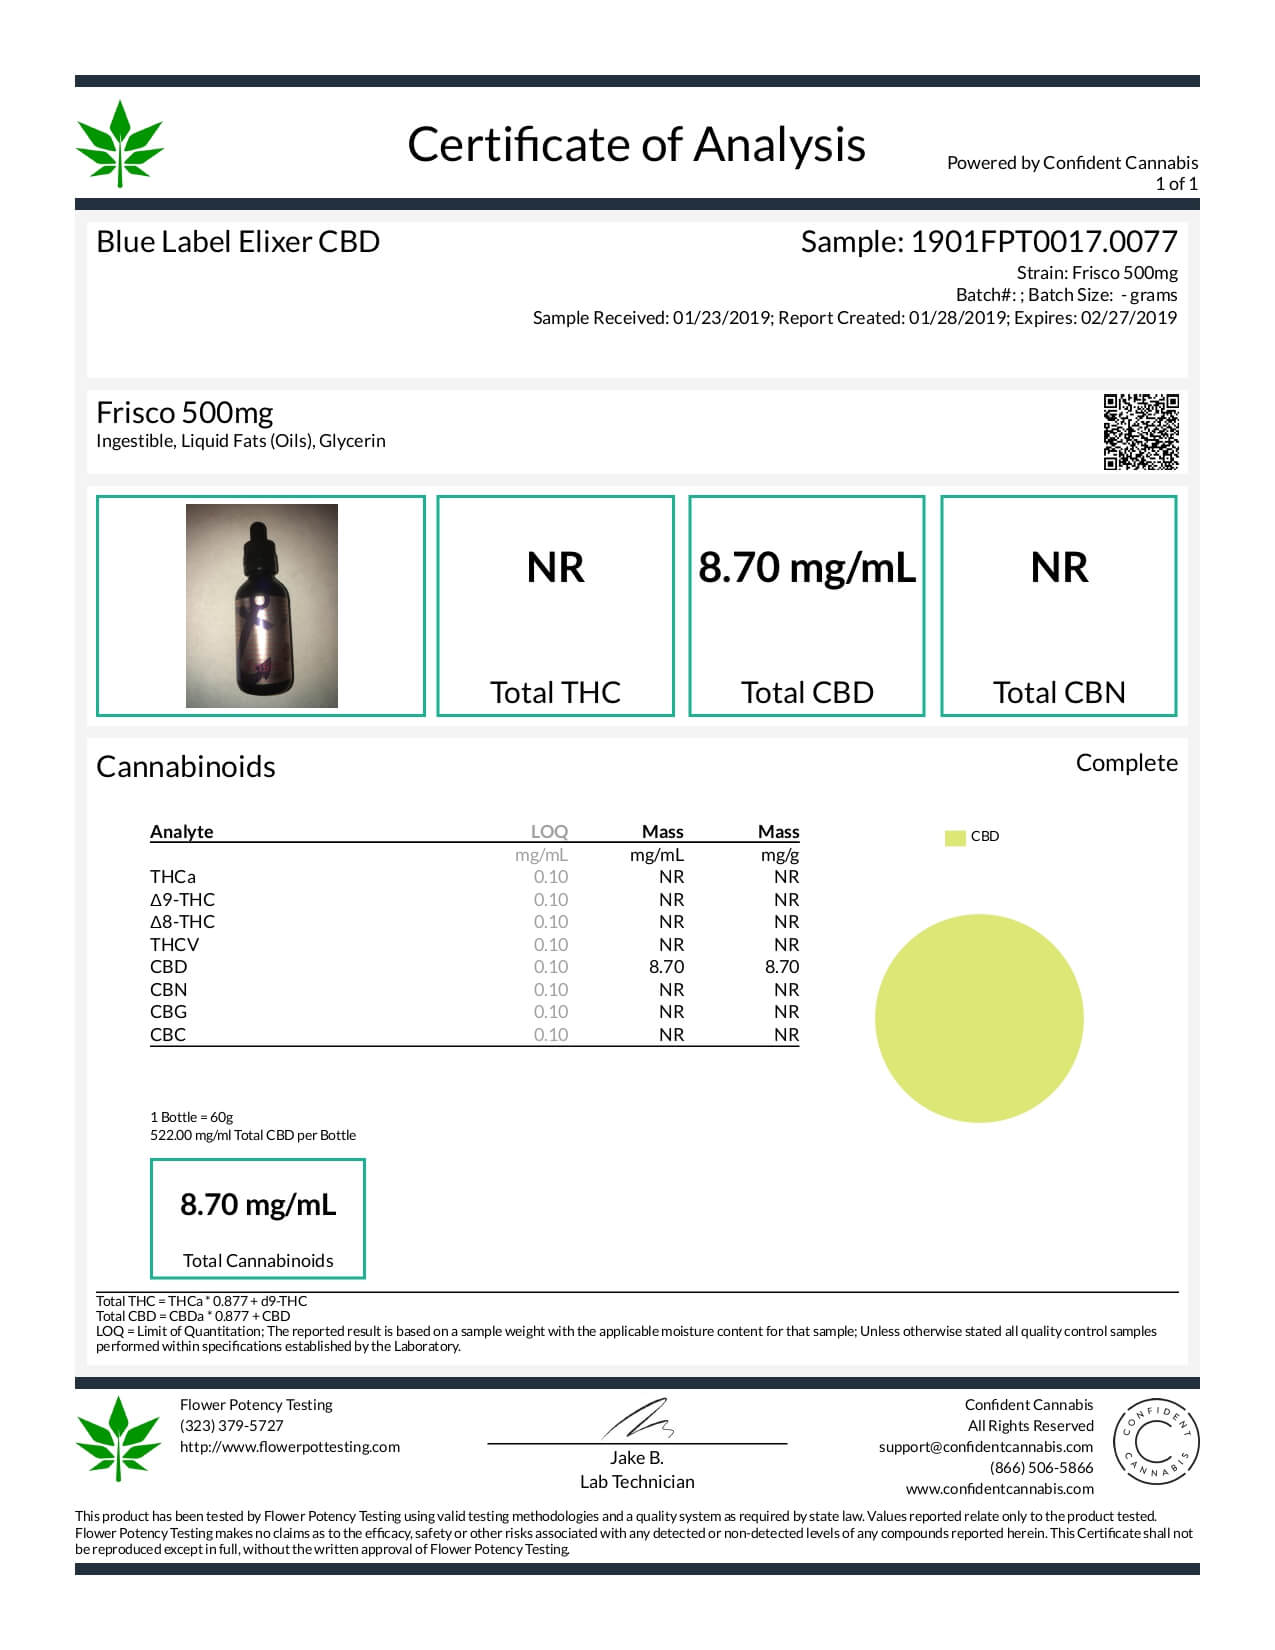 Blue Label CBD Vape Juice Frisco 500mg Lab Report